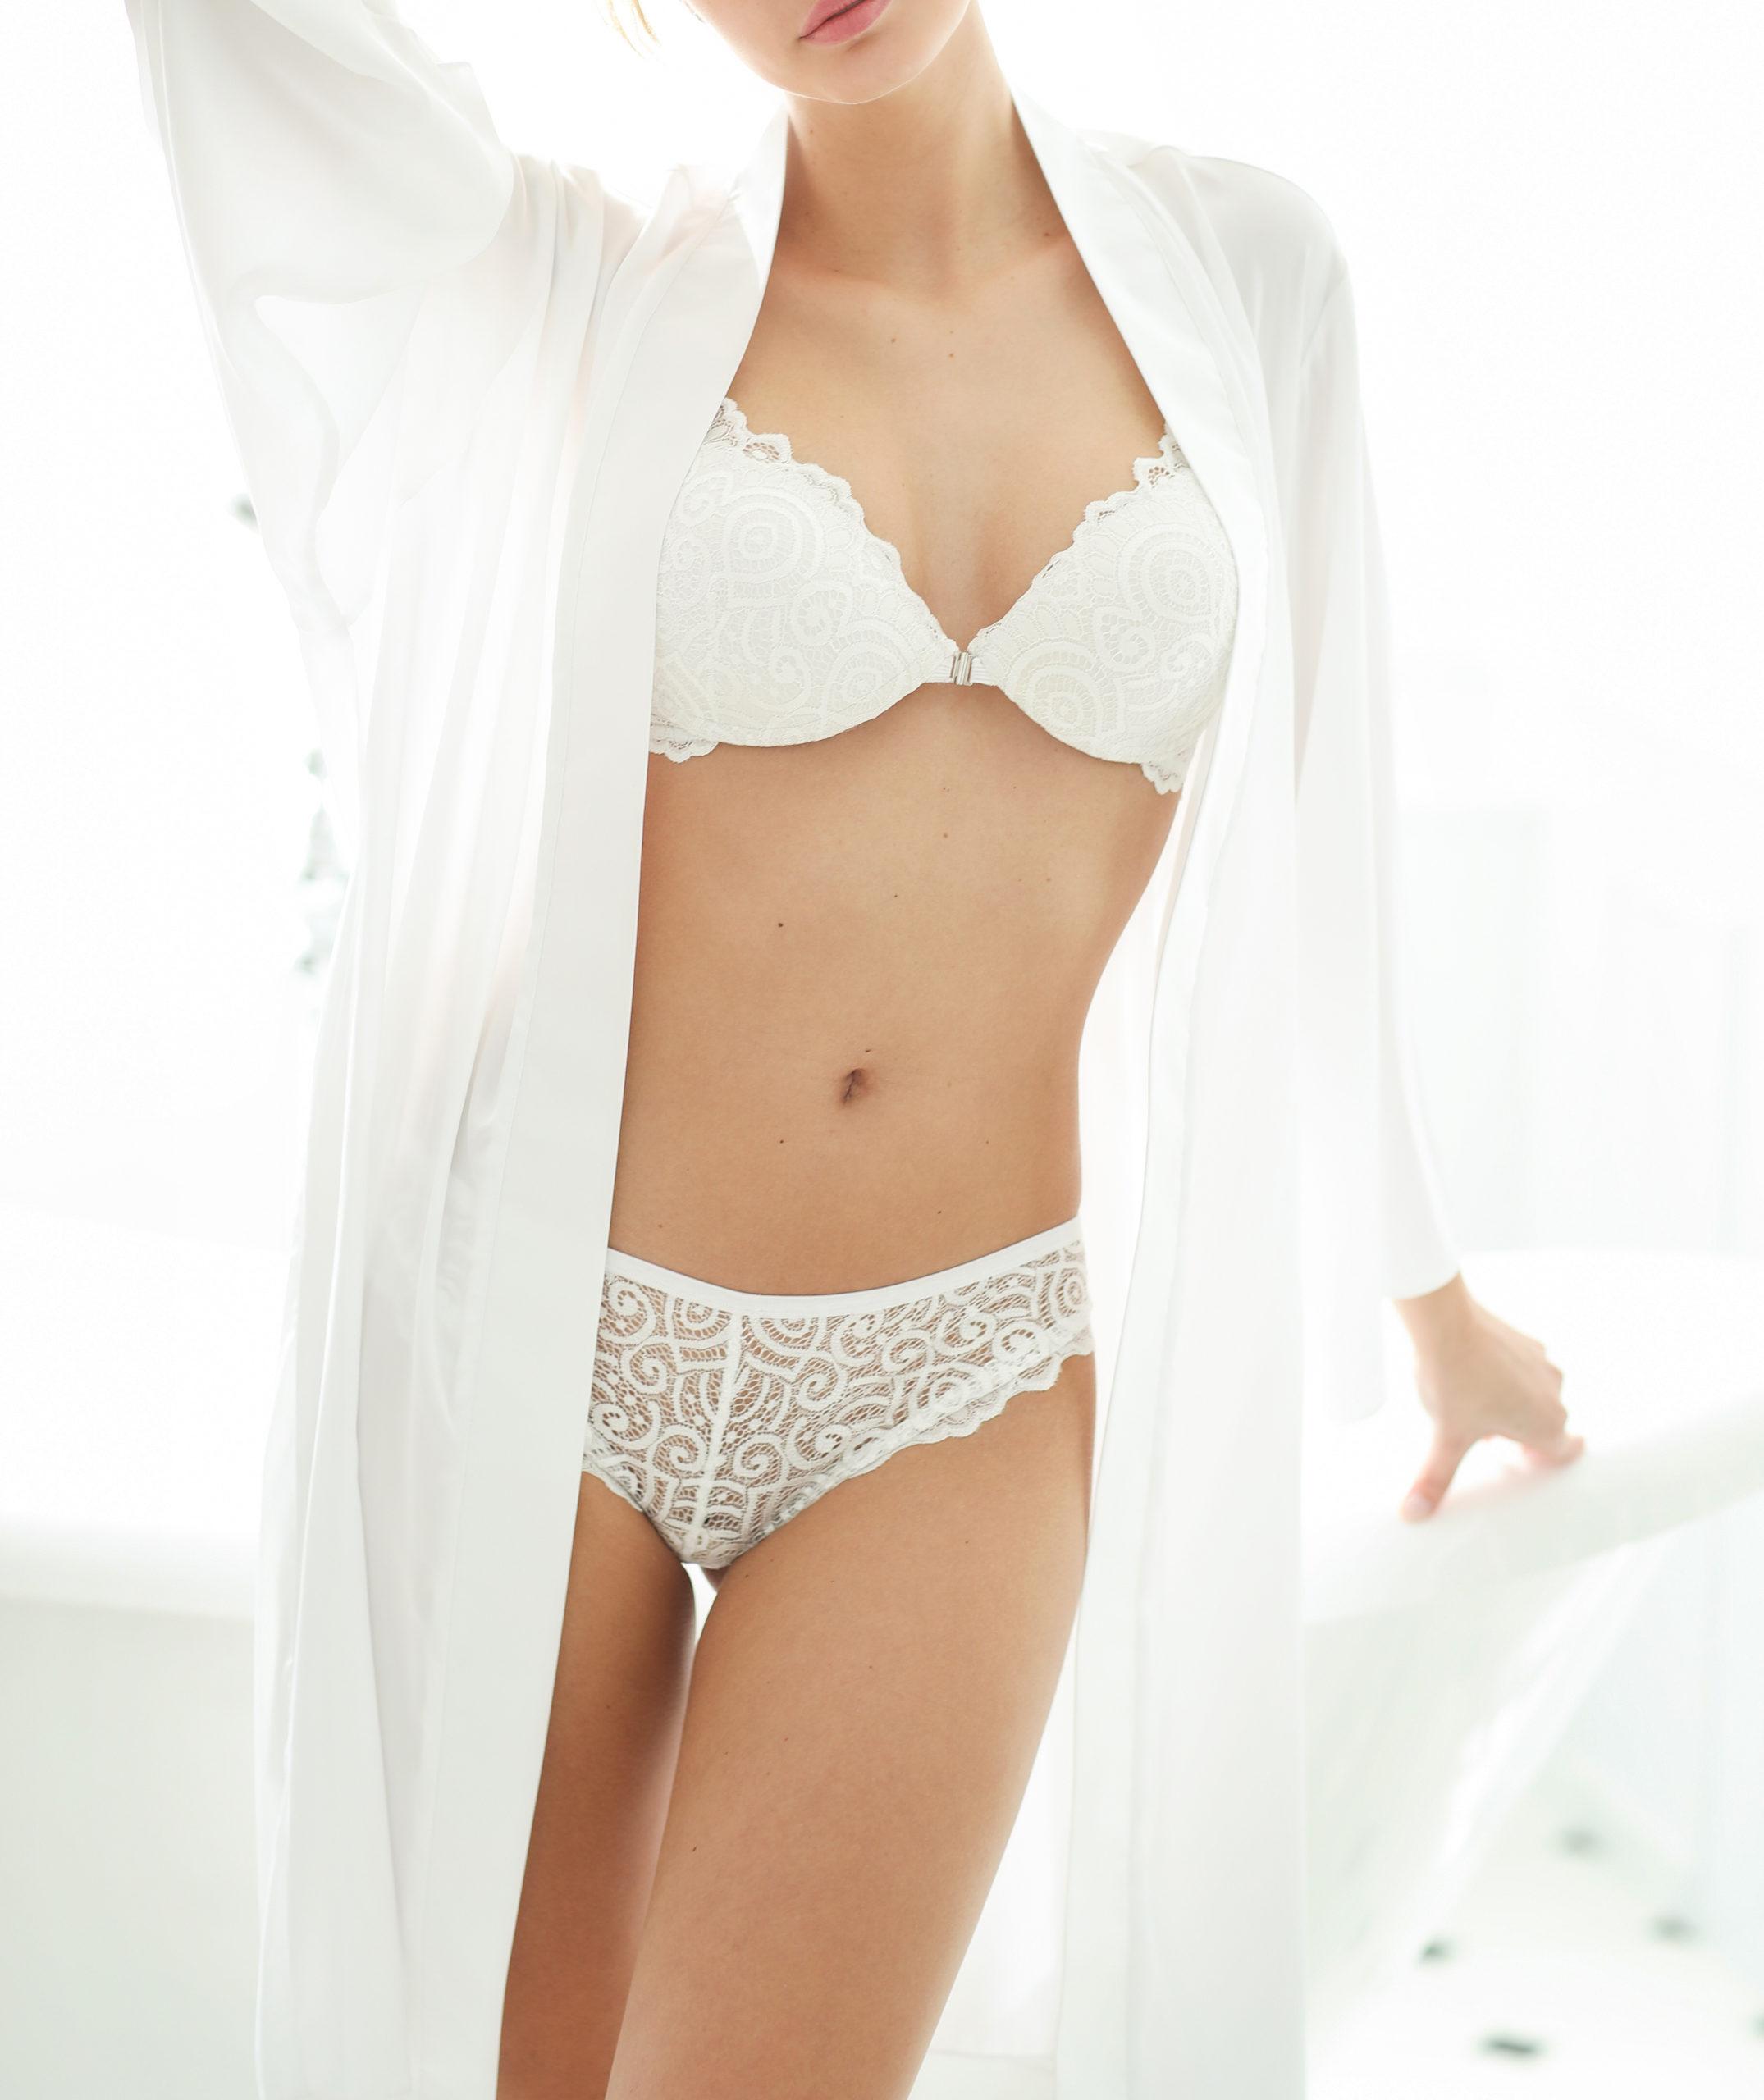 Vaginoplastia cirugía zona intima